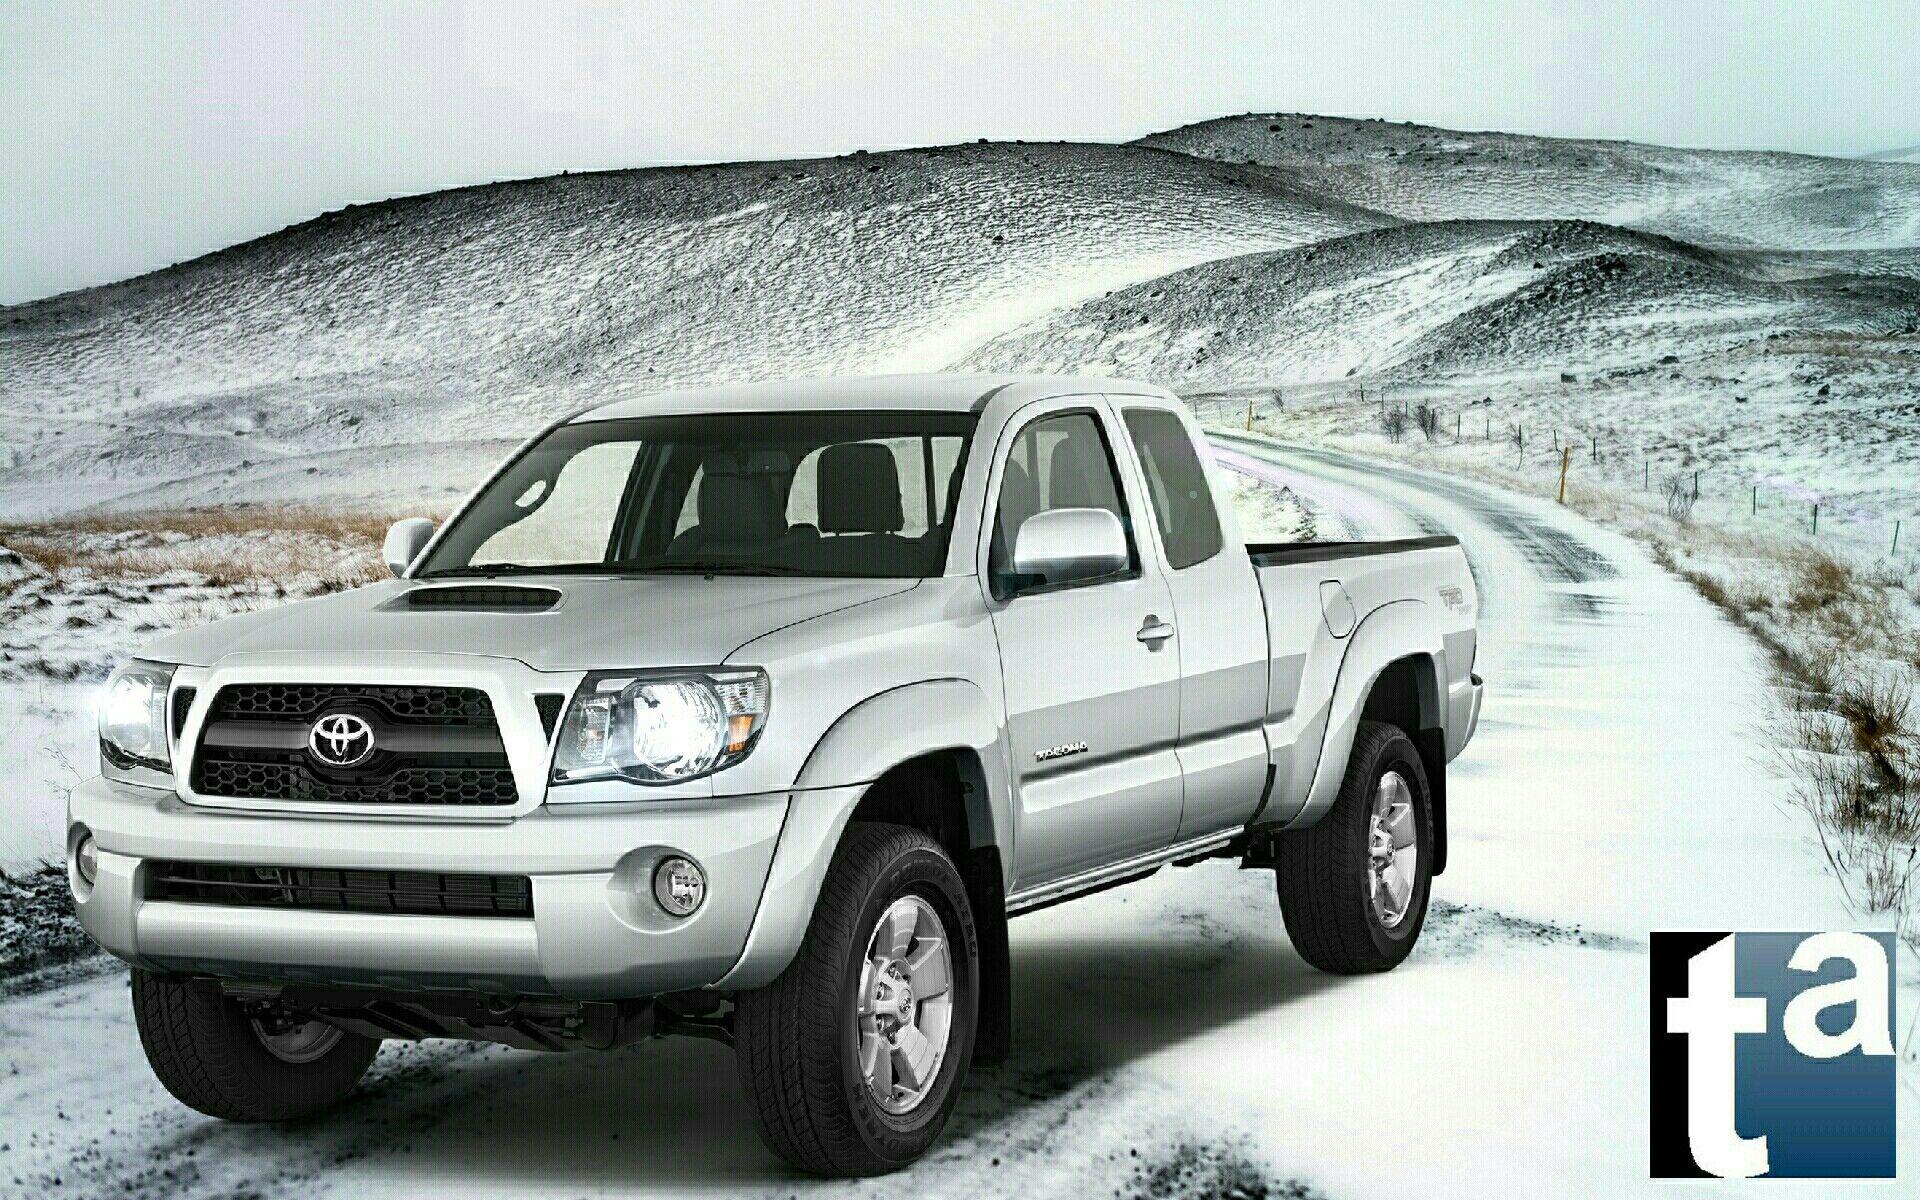 052 - WINTER WONDERLAND [Auto] #Toyota Tacoma #PickUp CAB PreRunner 2011 #Automotive #Trucks